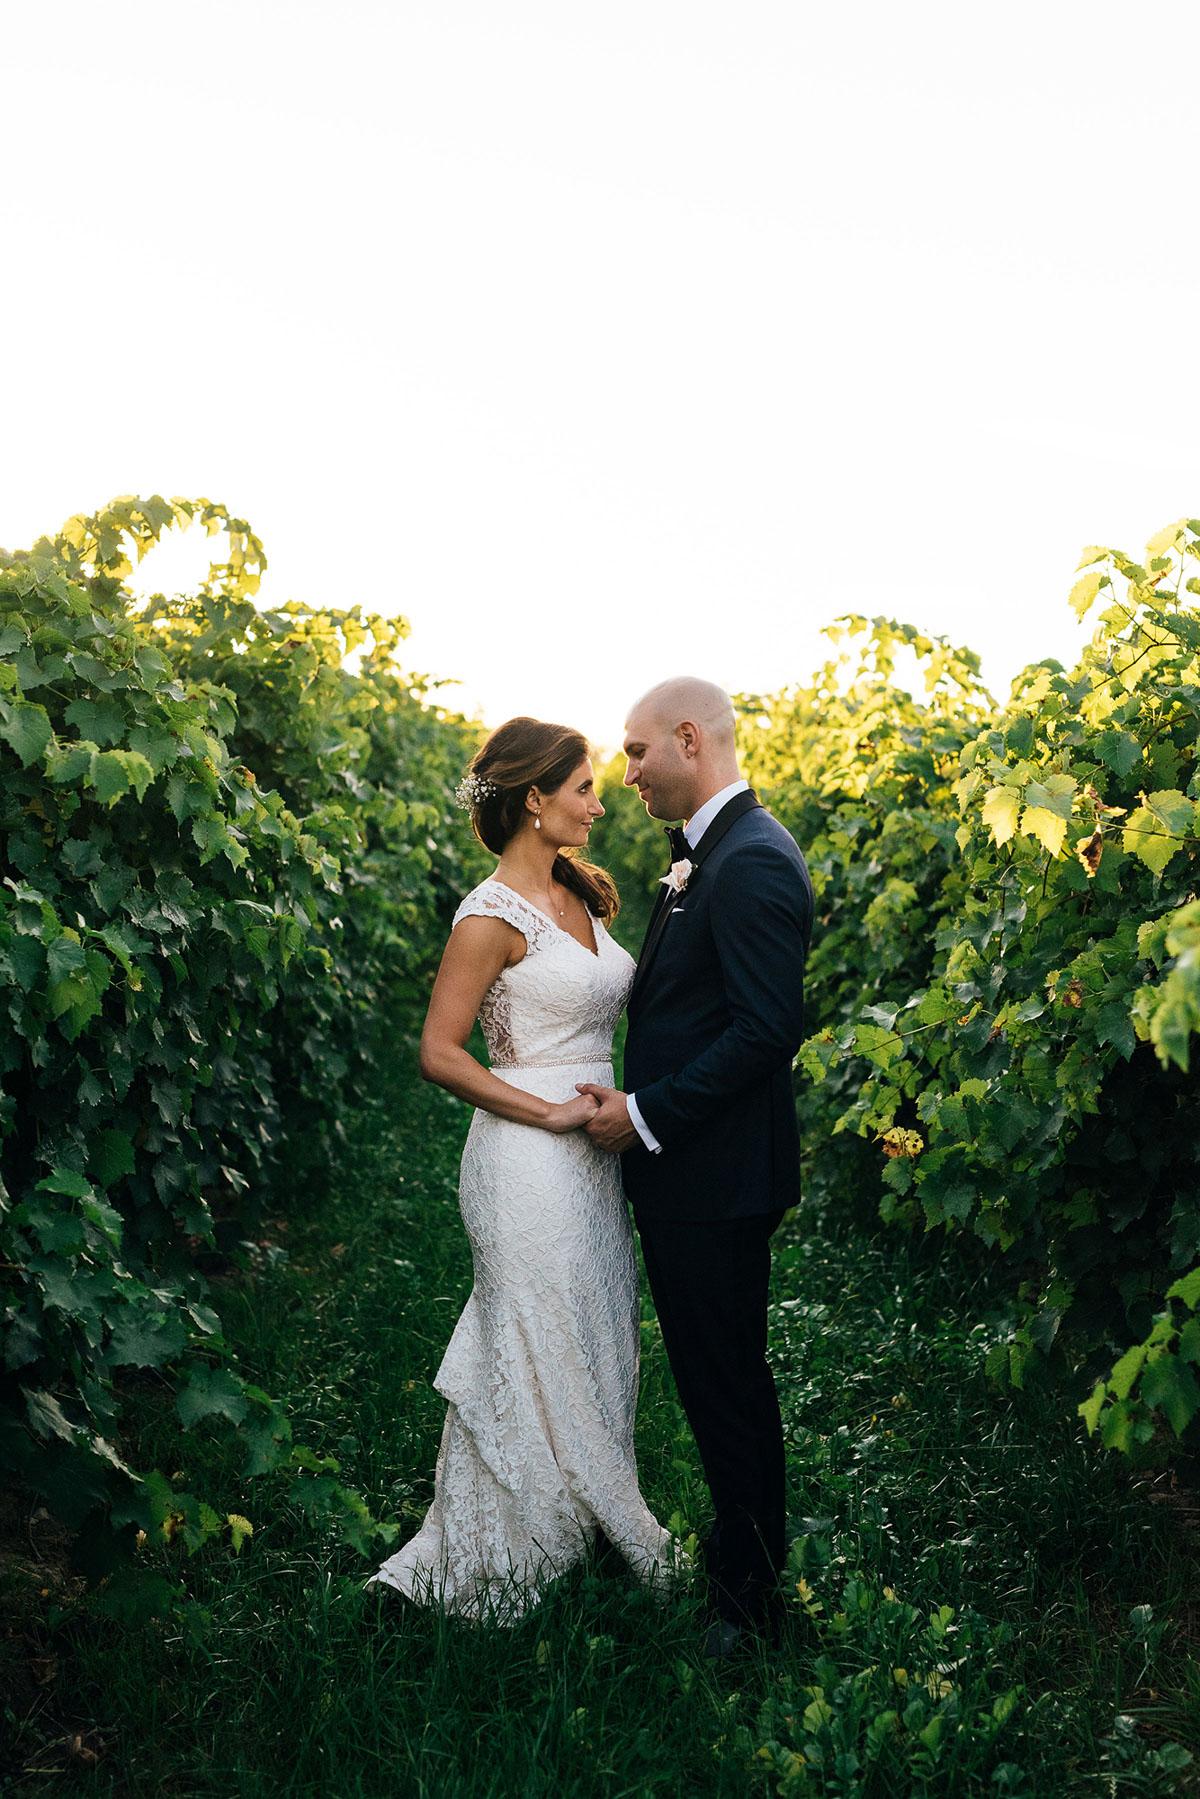 shaw-events-vineyard-bride-swish-list-kurtz-orchards-niagara-on-the-lake-wedding-26.jpg